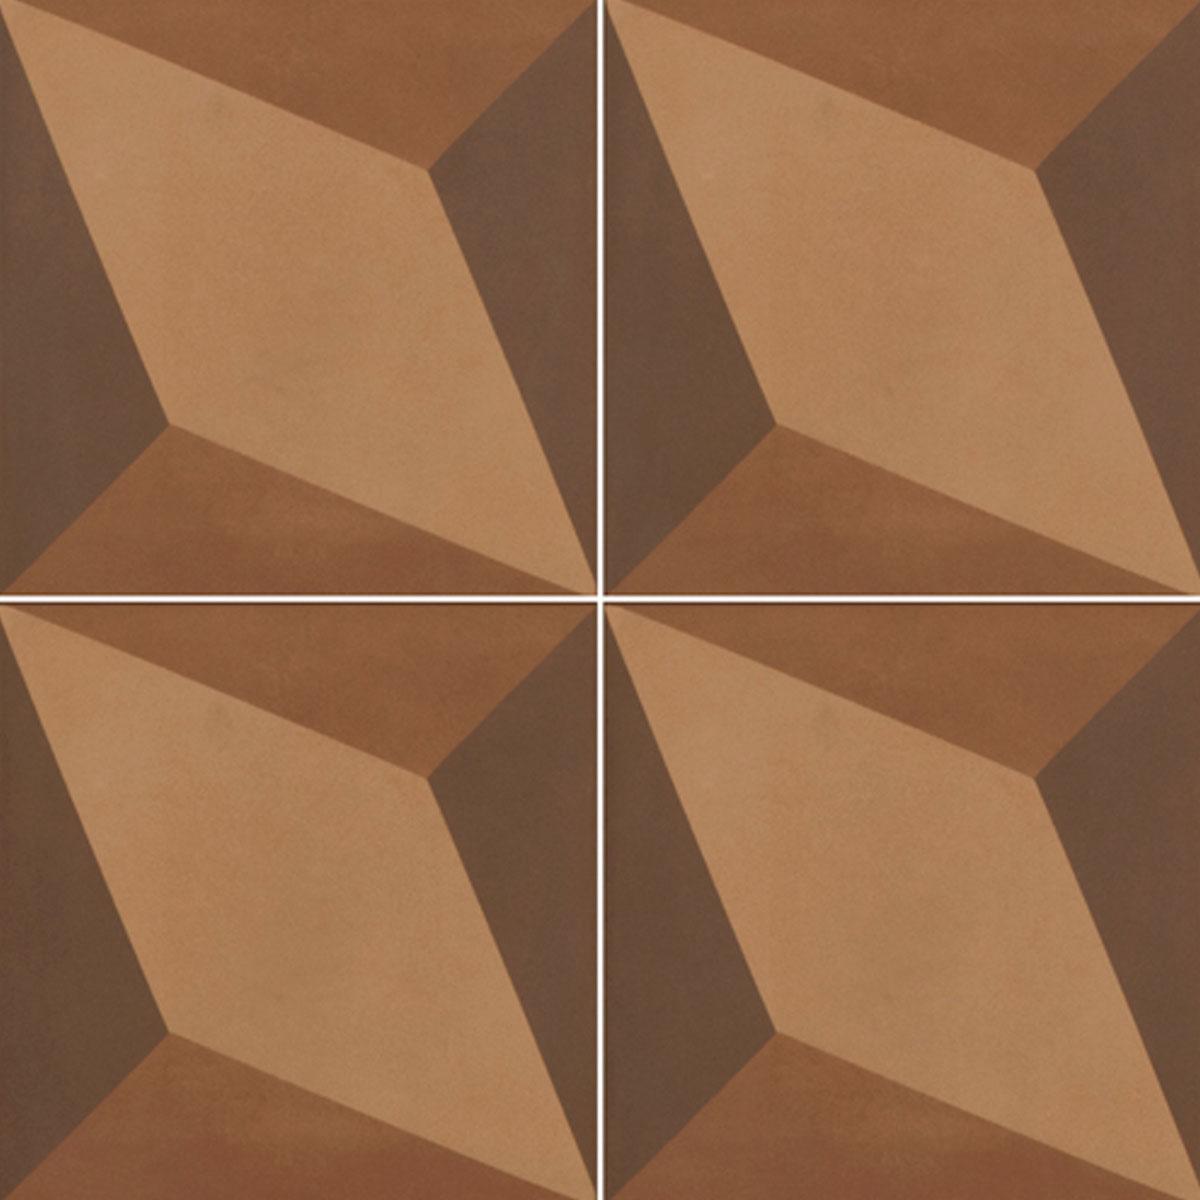 D_Segni Blend - Deco - Terra - Patterned Tiles - Stone3